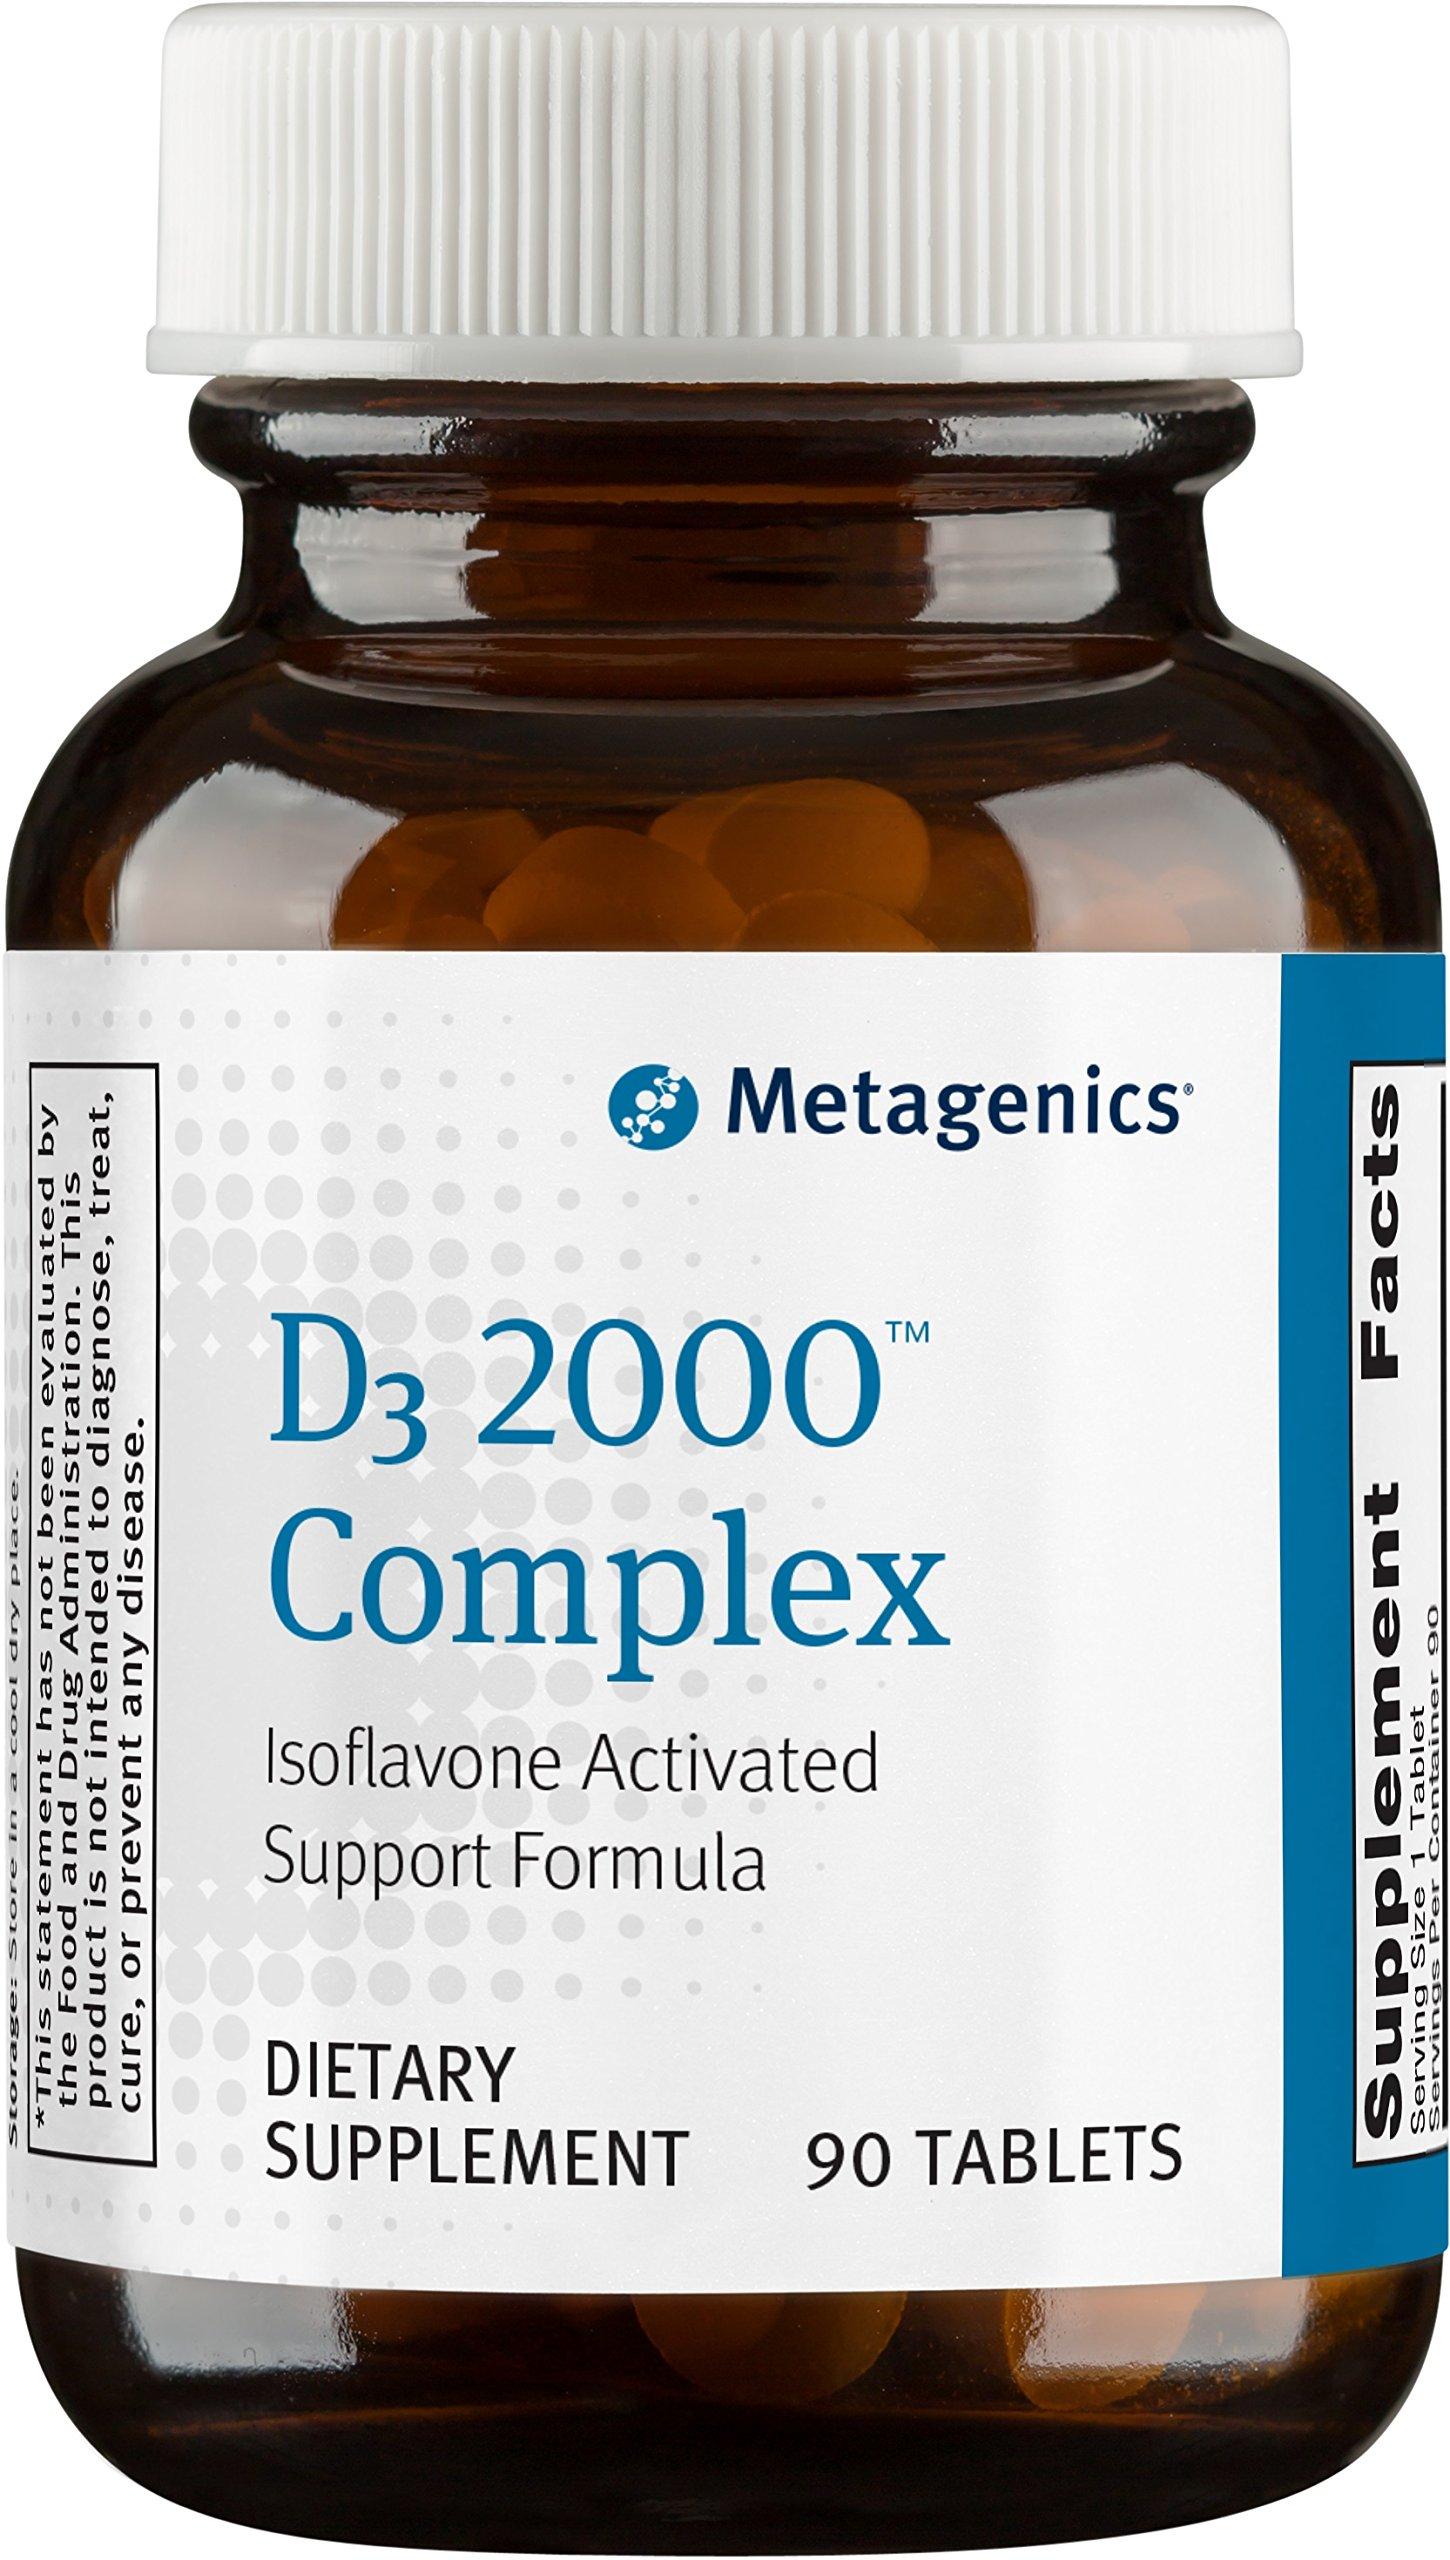 Metagenics - D3 2000 Complex, 90 Count by Metagenics